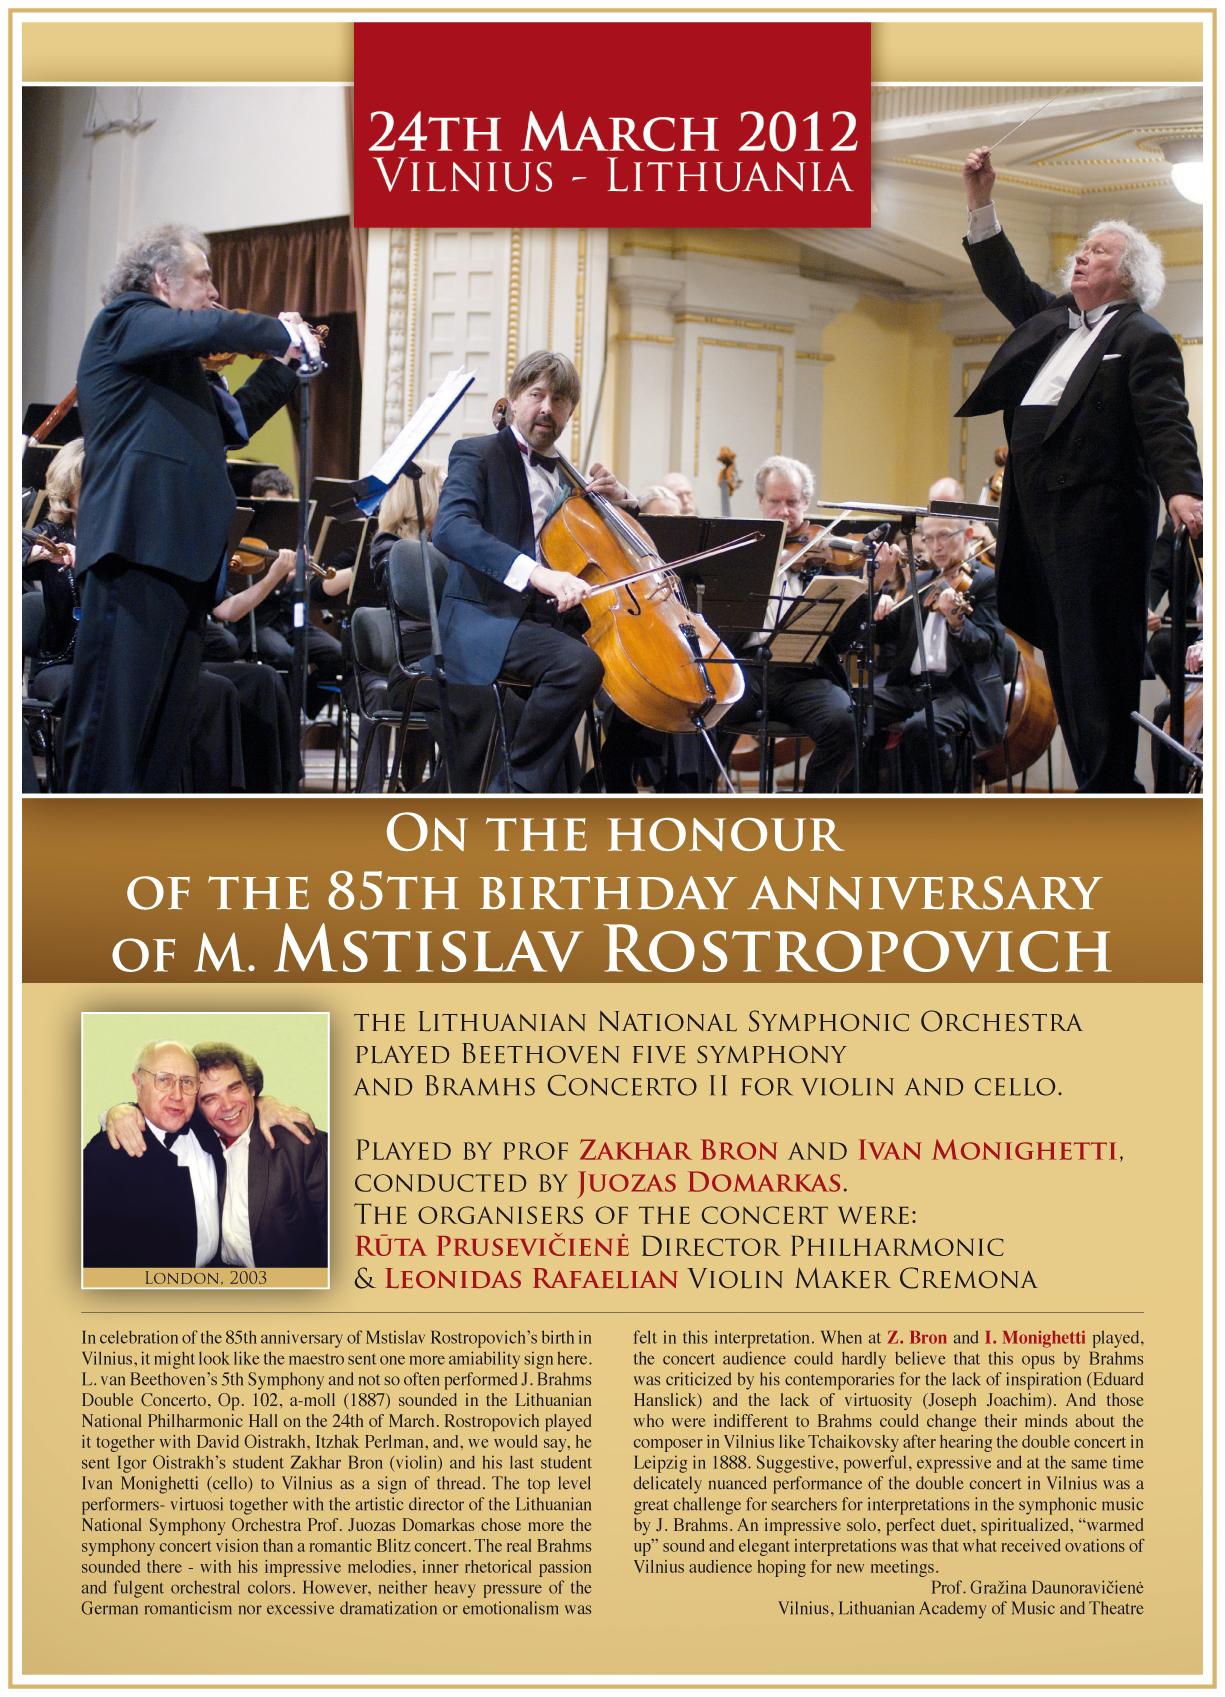 Memorial Concert organization